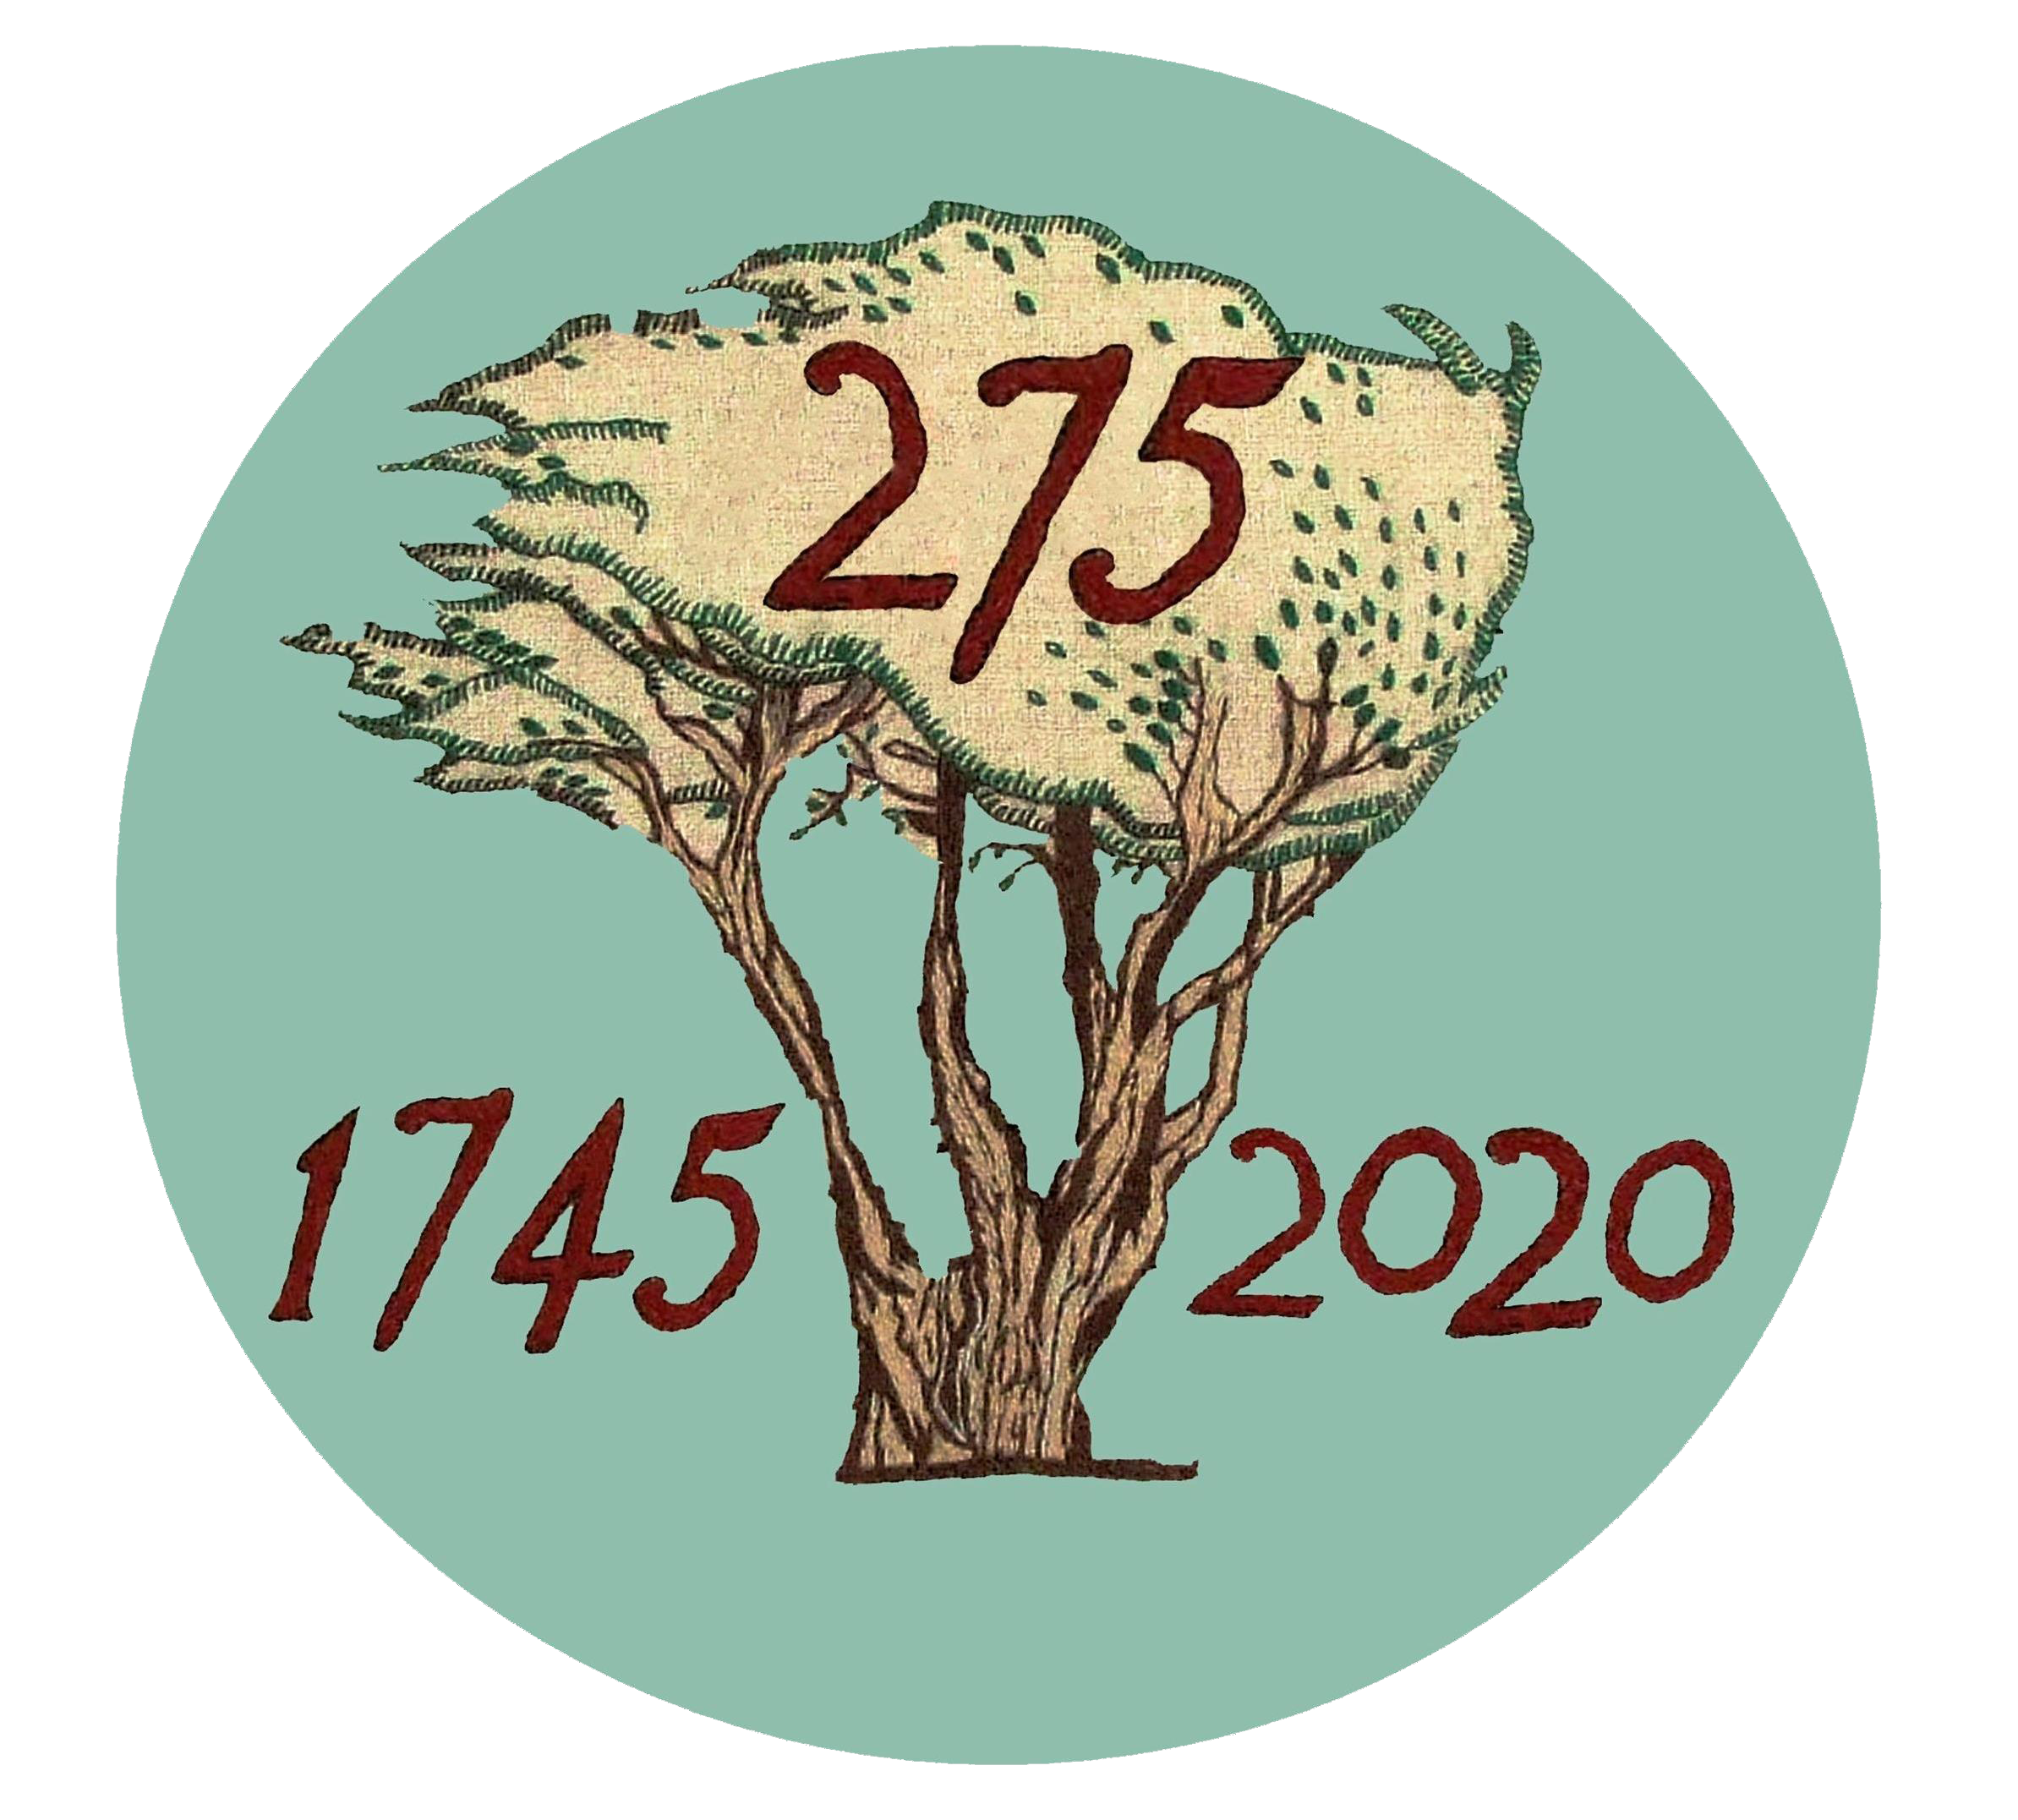 PRESTONPANS 1745- 2020